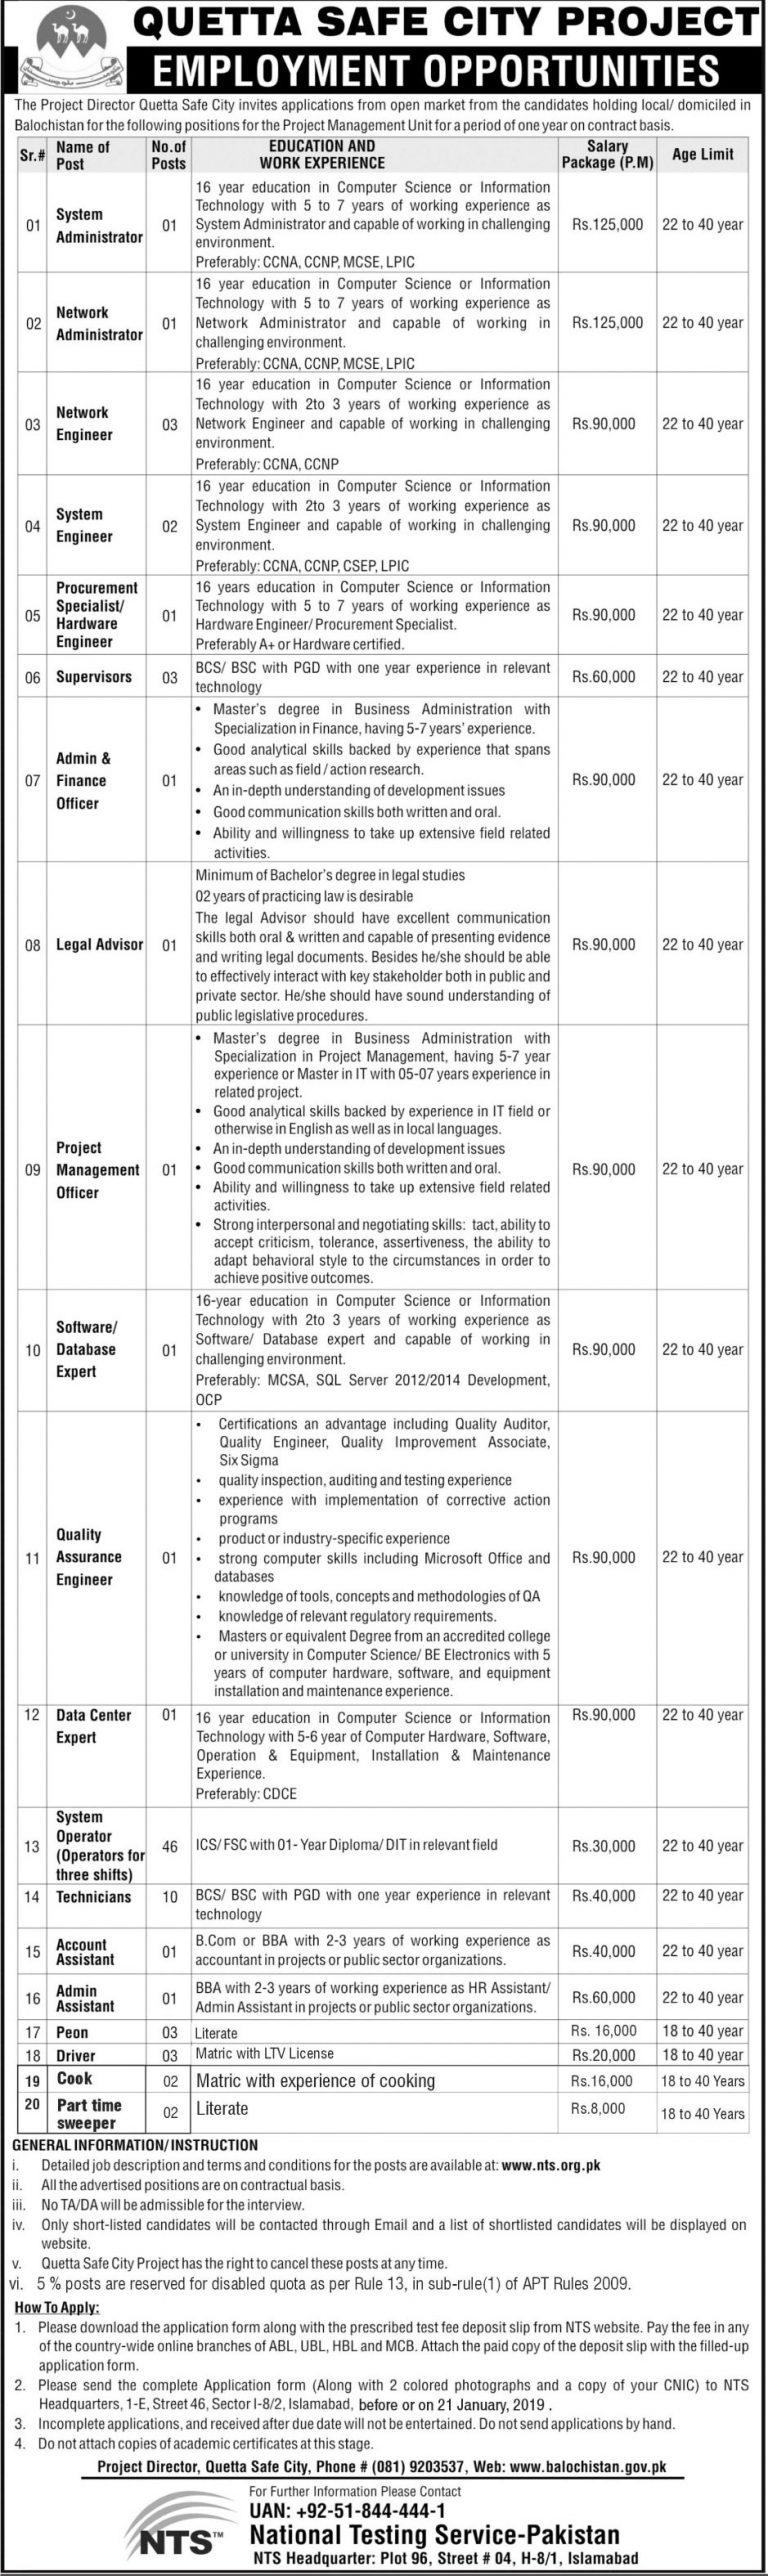 Quetta Safe City Project Jobs 2019 NTS Application Form Download